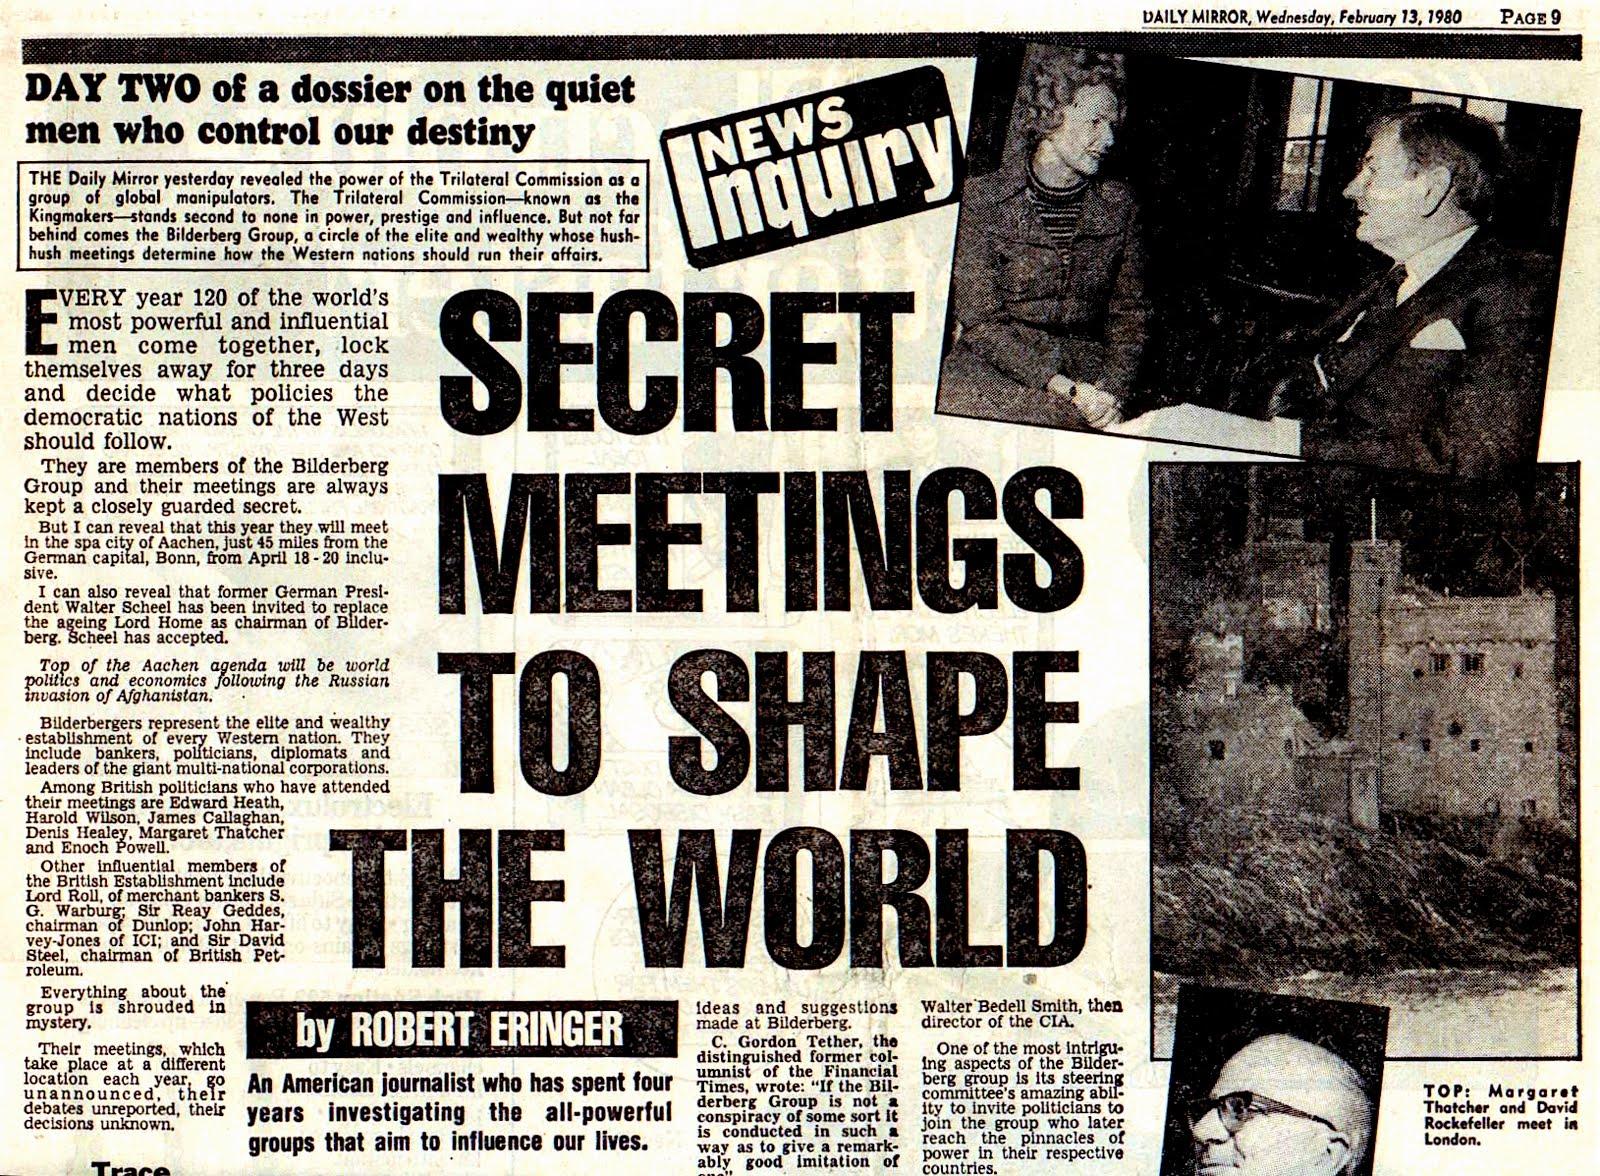 Bilderberg Group, article